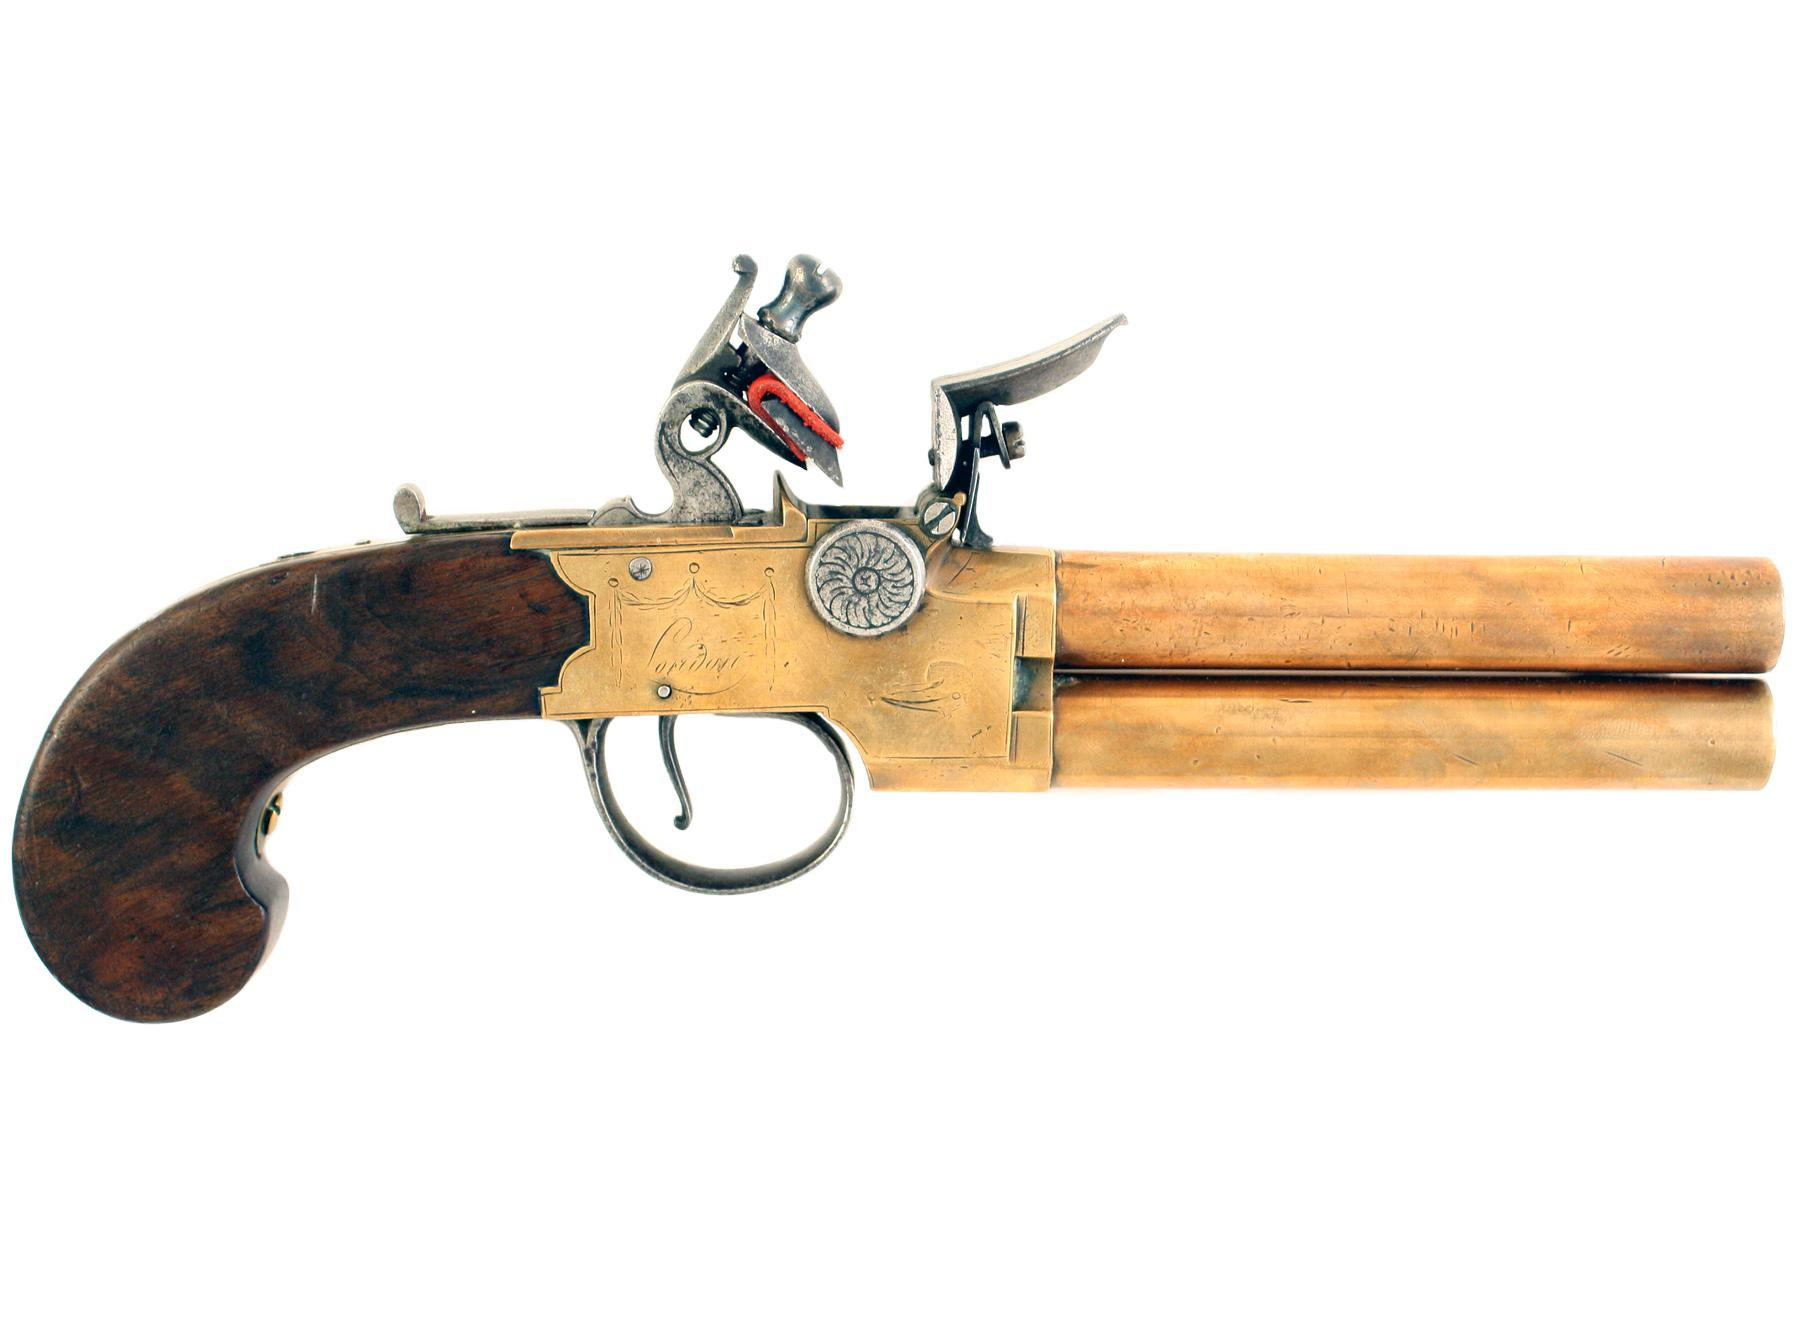 A Flintlock Tap-Action Pistol